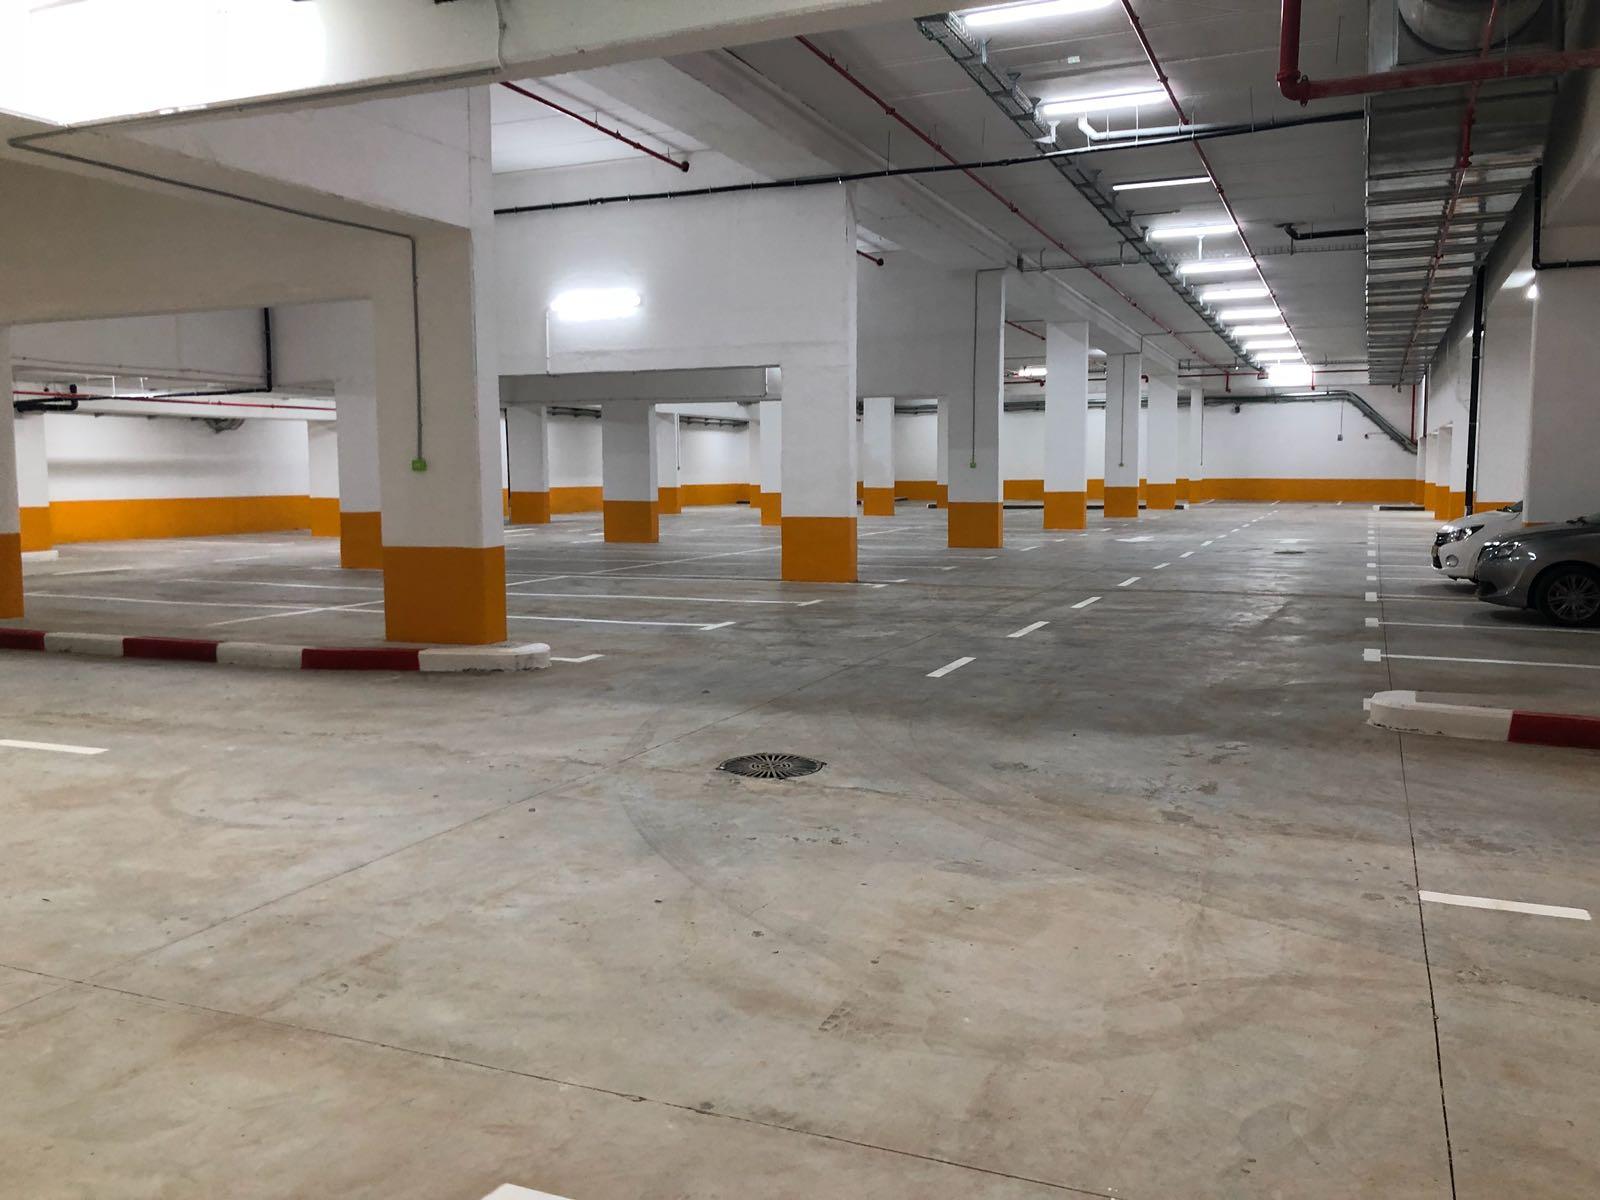 Photo of נפתח חניון תת קרקעי חדש לתושבי האזור ברחוב בעולי הגרדום